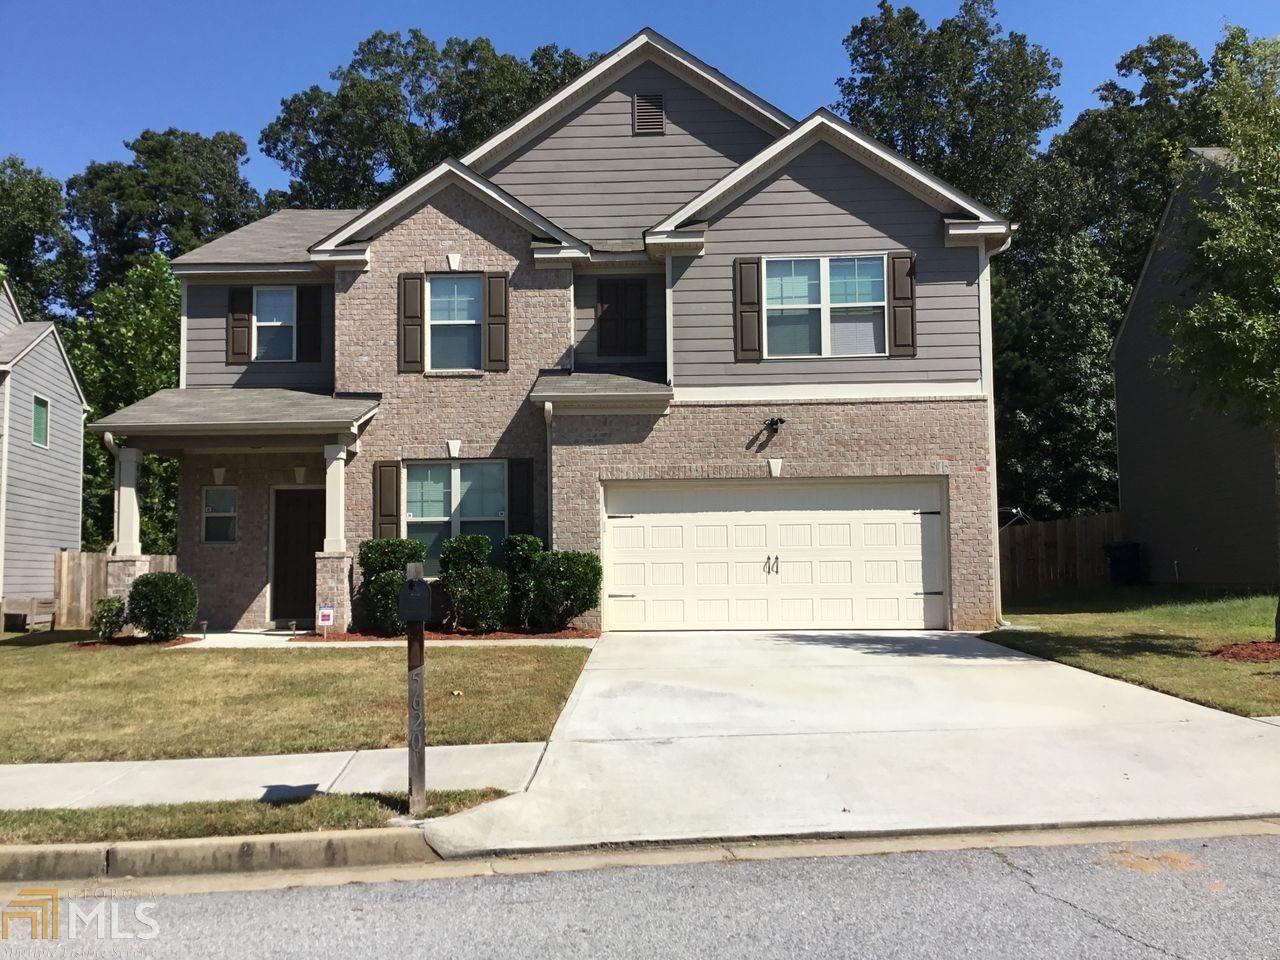 5620 Wisbech Way, Atlanta, GA 30349 - #: 8870874